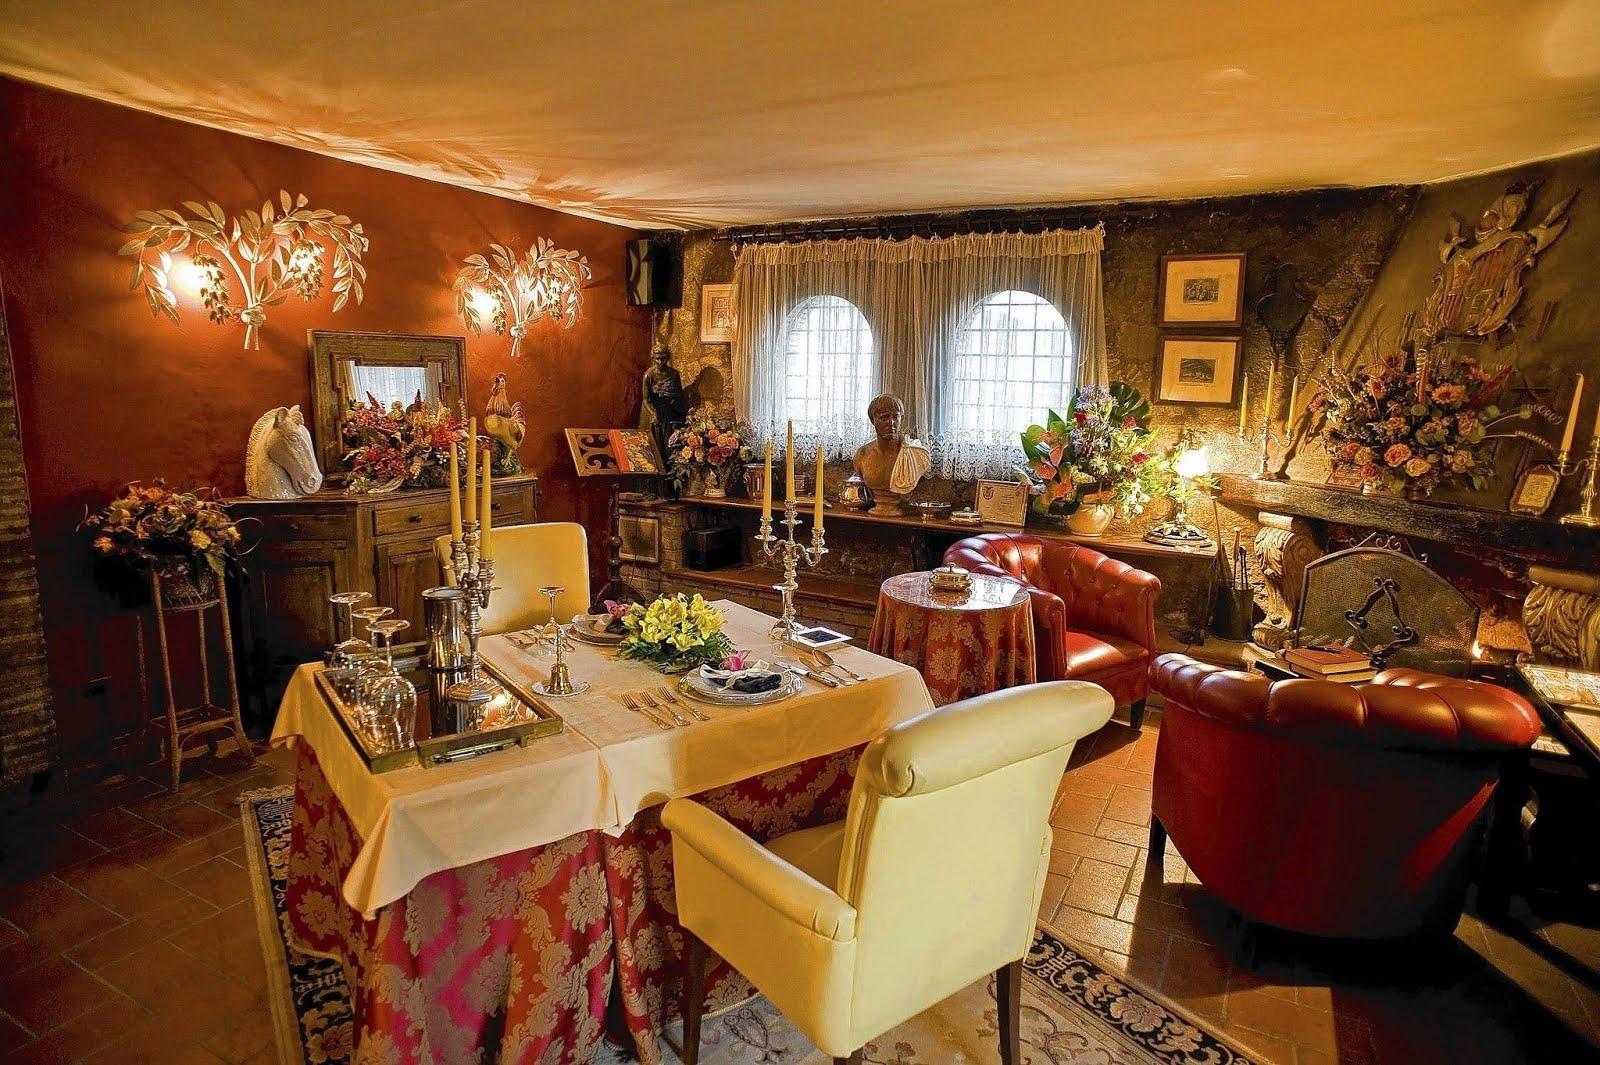 Traveloscopy Travelblog Tea For Two At Worlds Smallest Restaurant - Table for two restaurant